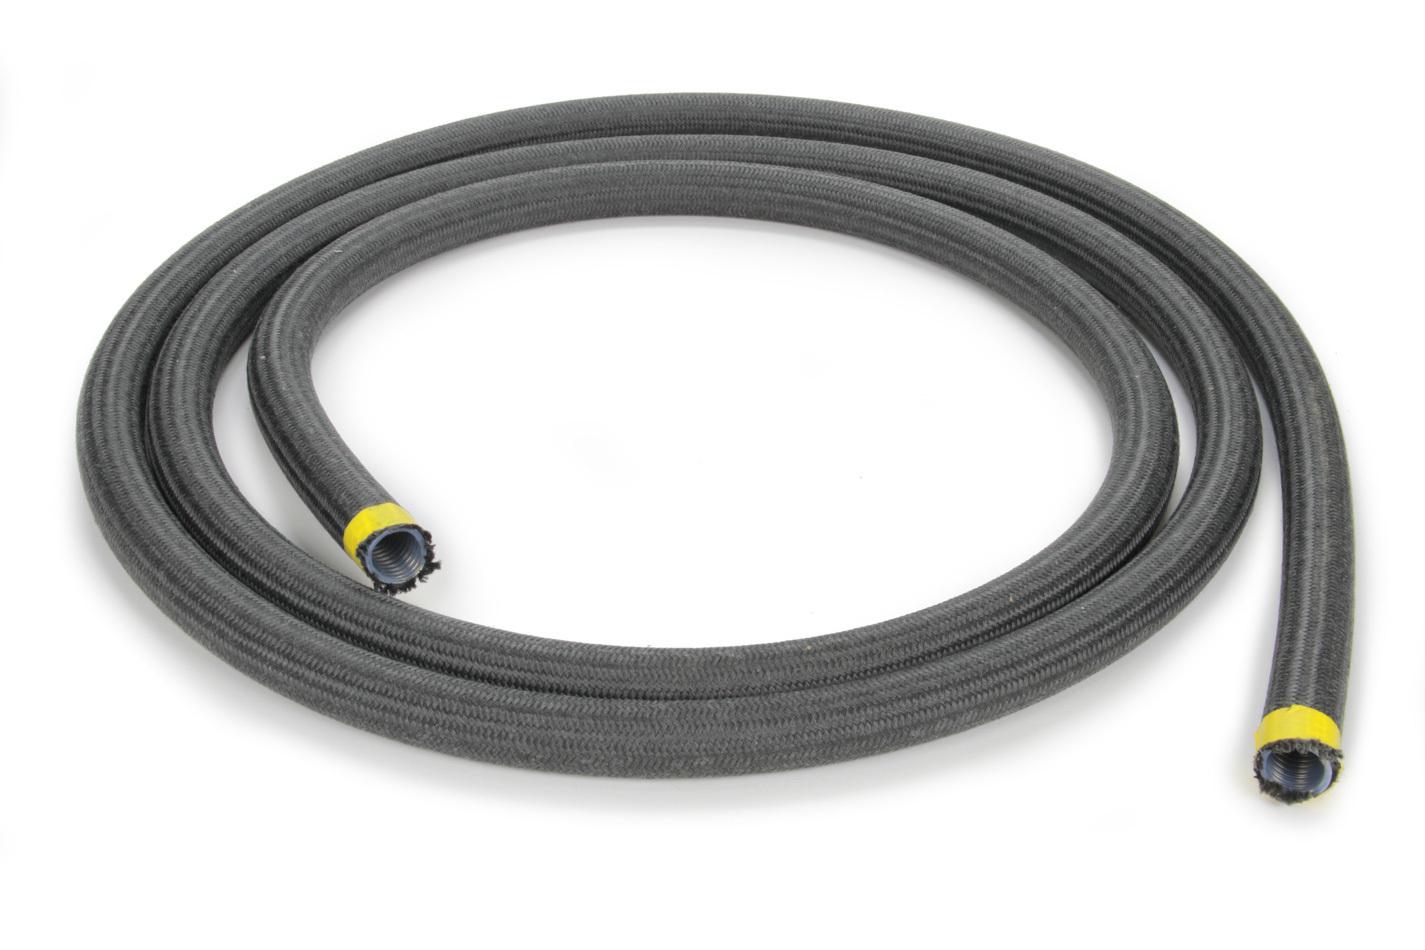 Earls 651010ERL Hose, Ultra-Flex, 10 AN, 10 ft, Braided Kevlar, Black, Each